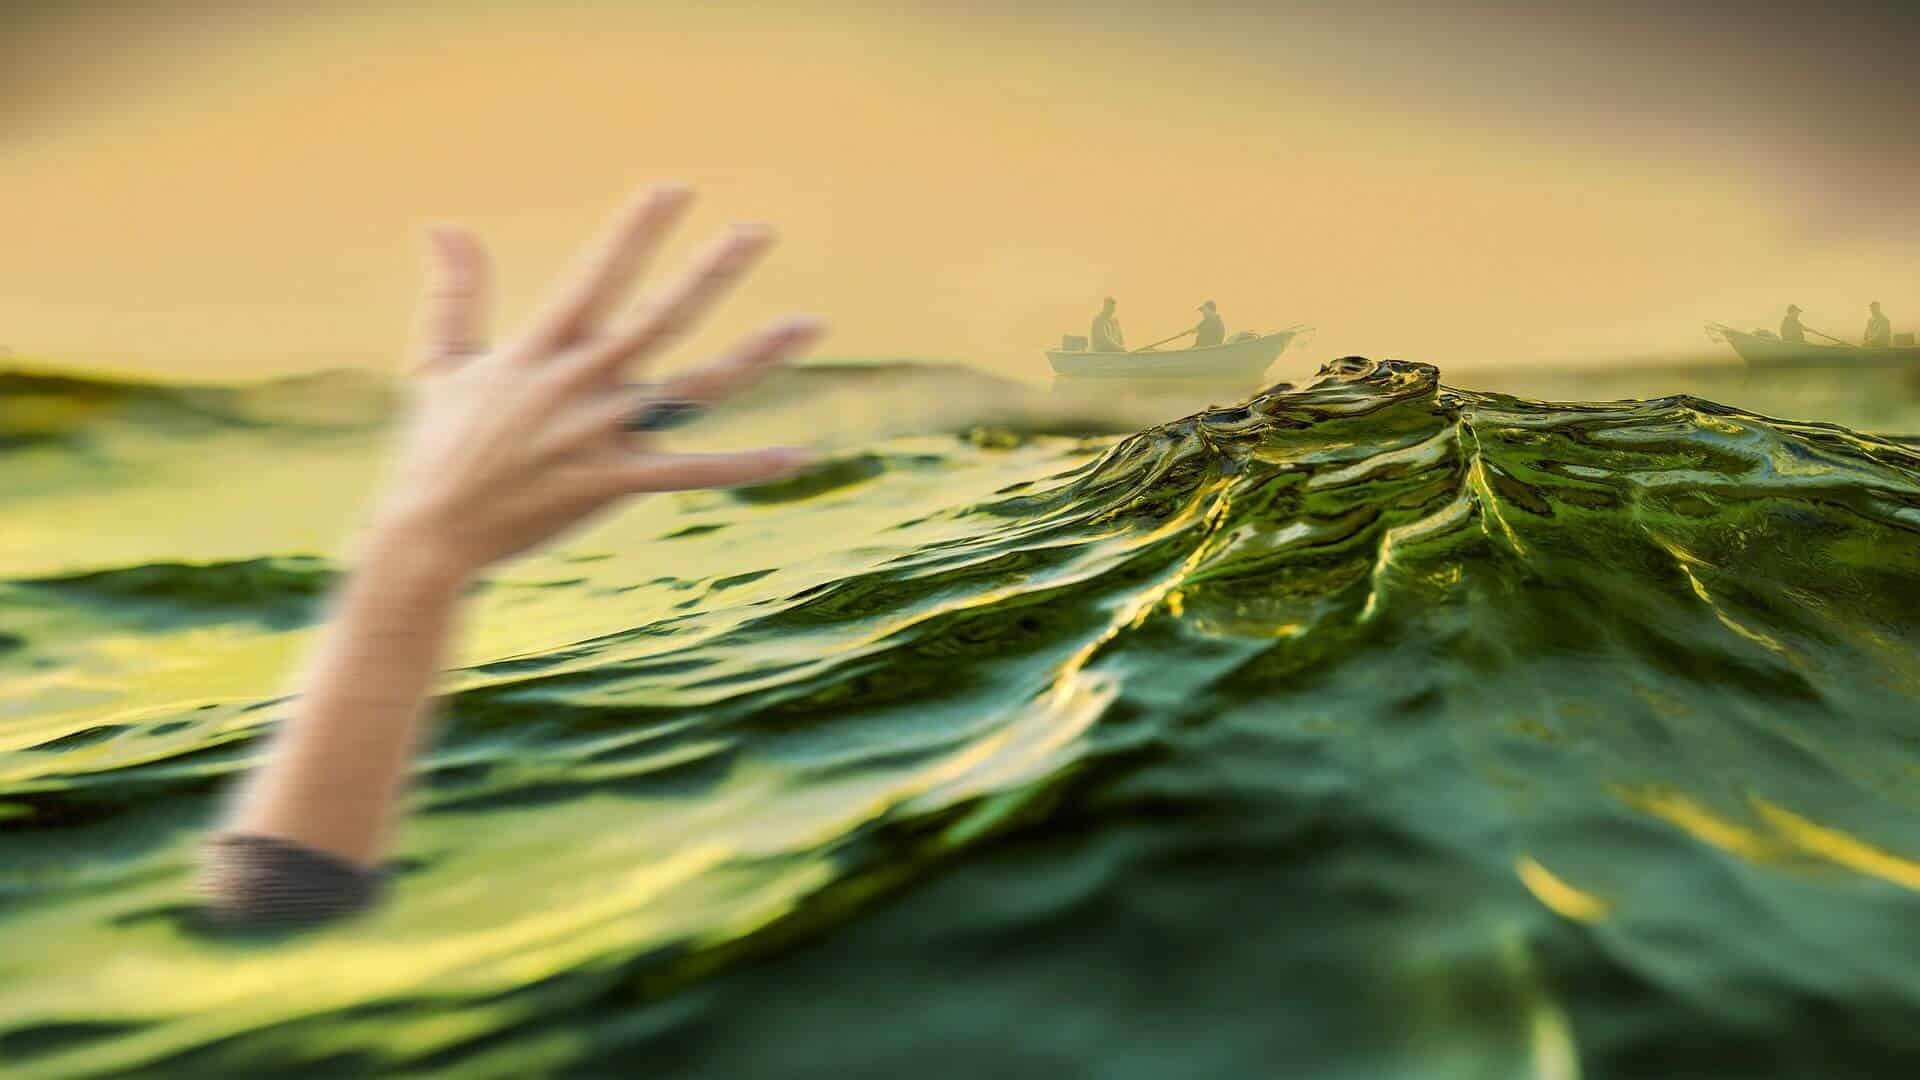 Near drowning victim